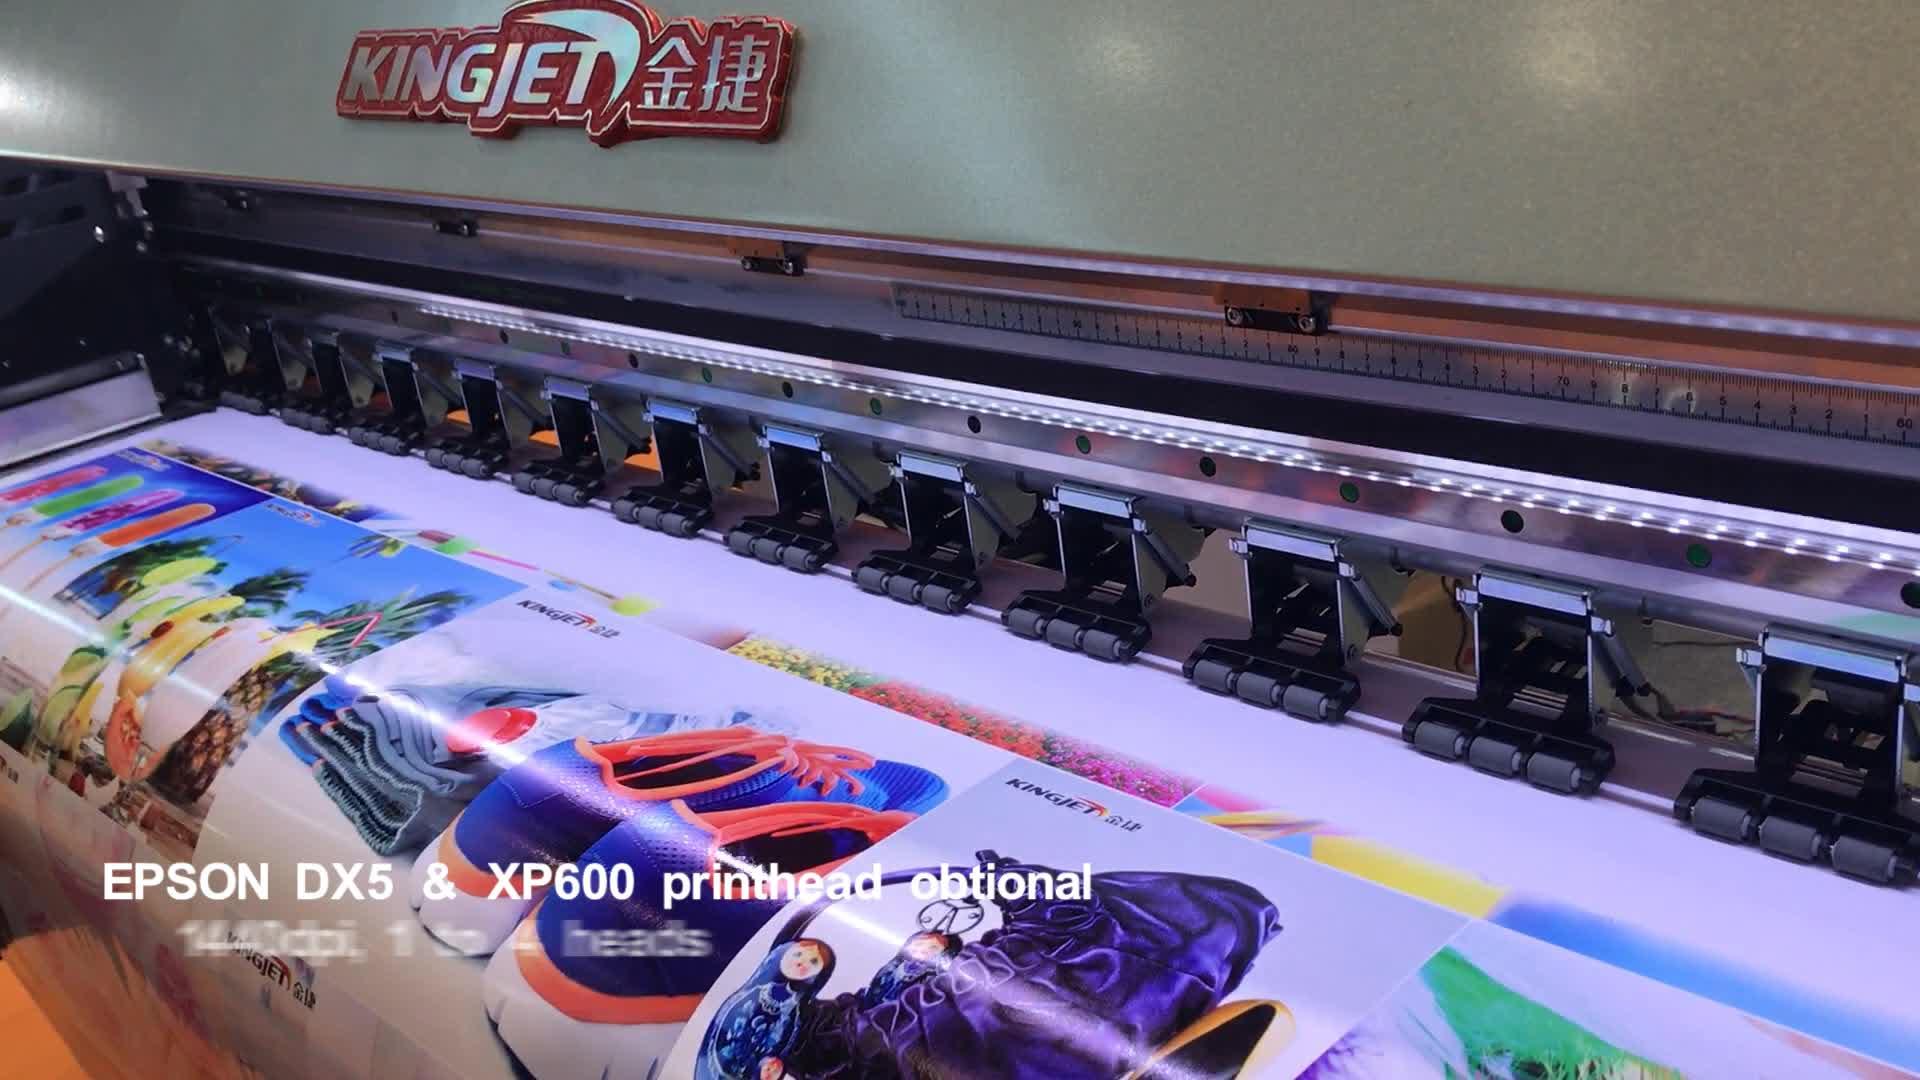 70sqm/h DX5 XP600 디지털 프린터 1.6m 1.8m 3.2m 중국 DX5 플로터 대형 포스터 캔버스 비닐 포장 에코 솔벤트 프린터